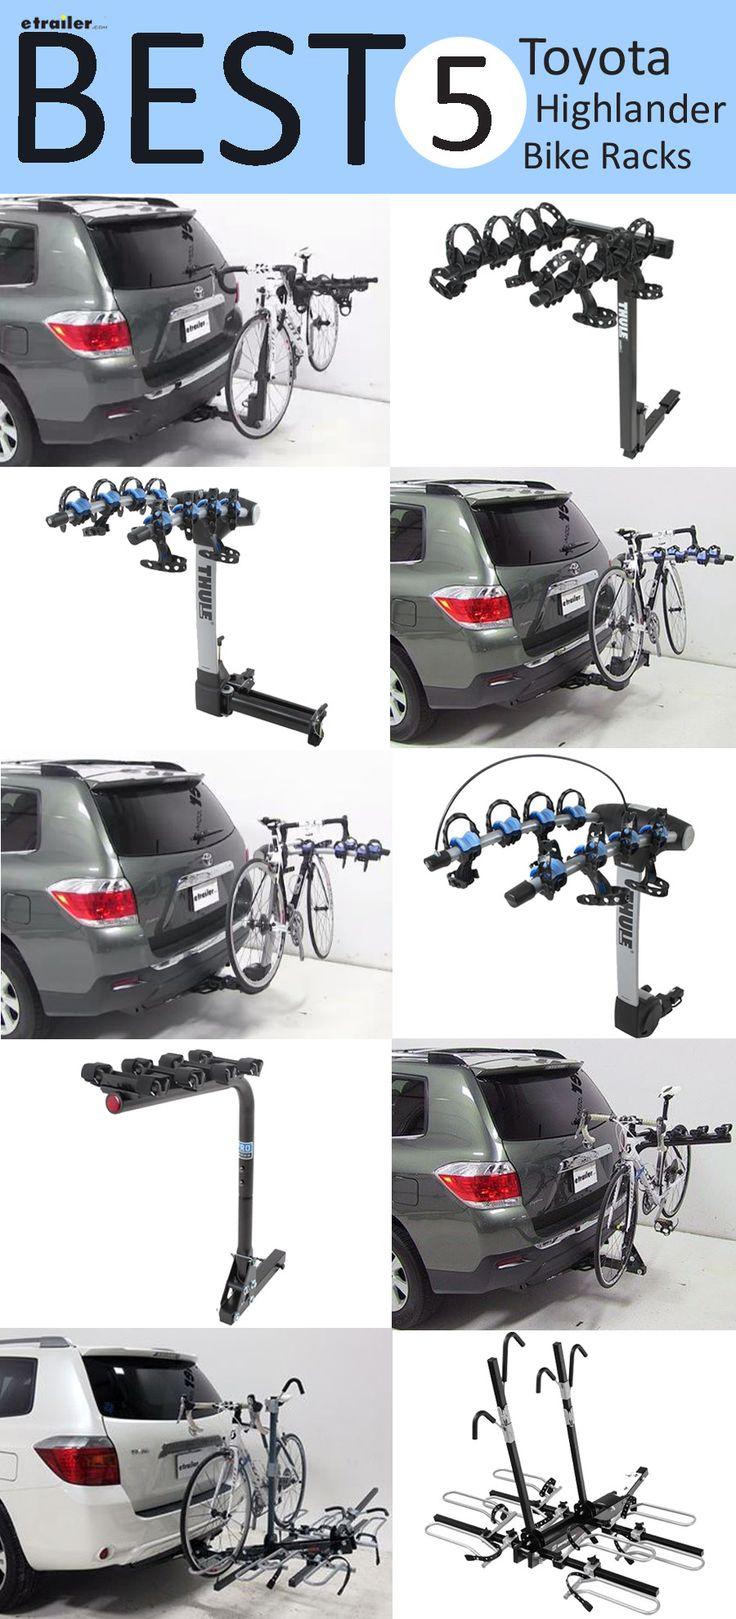 Best 5 toyota highlander bike racks hitch roof and hatch bike racks for your highlander racks for 2 to 4 bikes swinging tilting and platform r